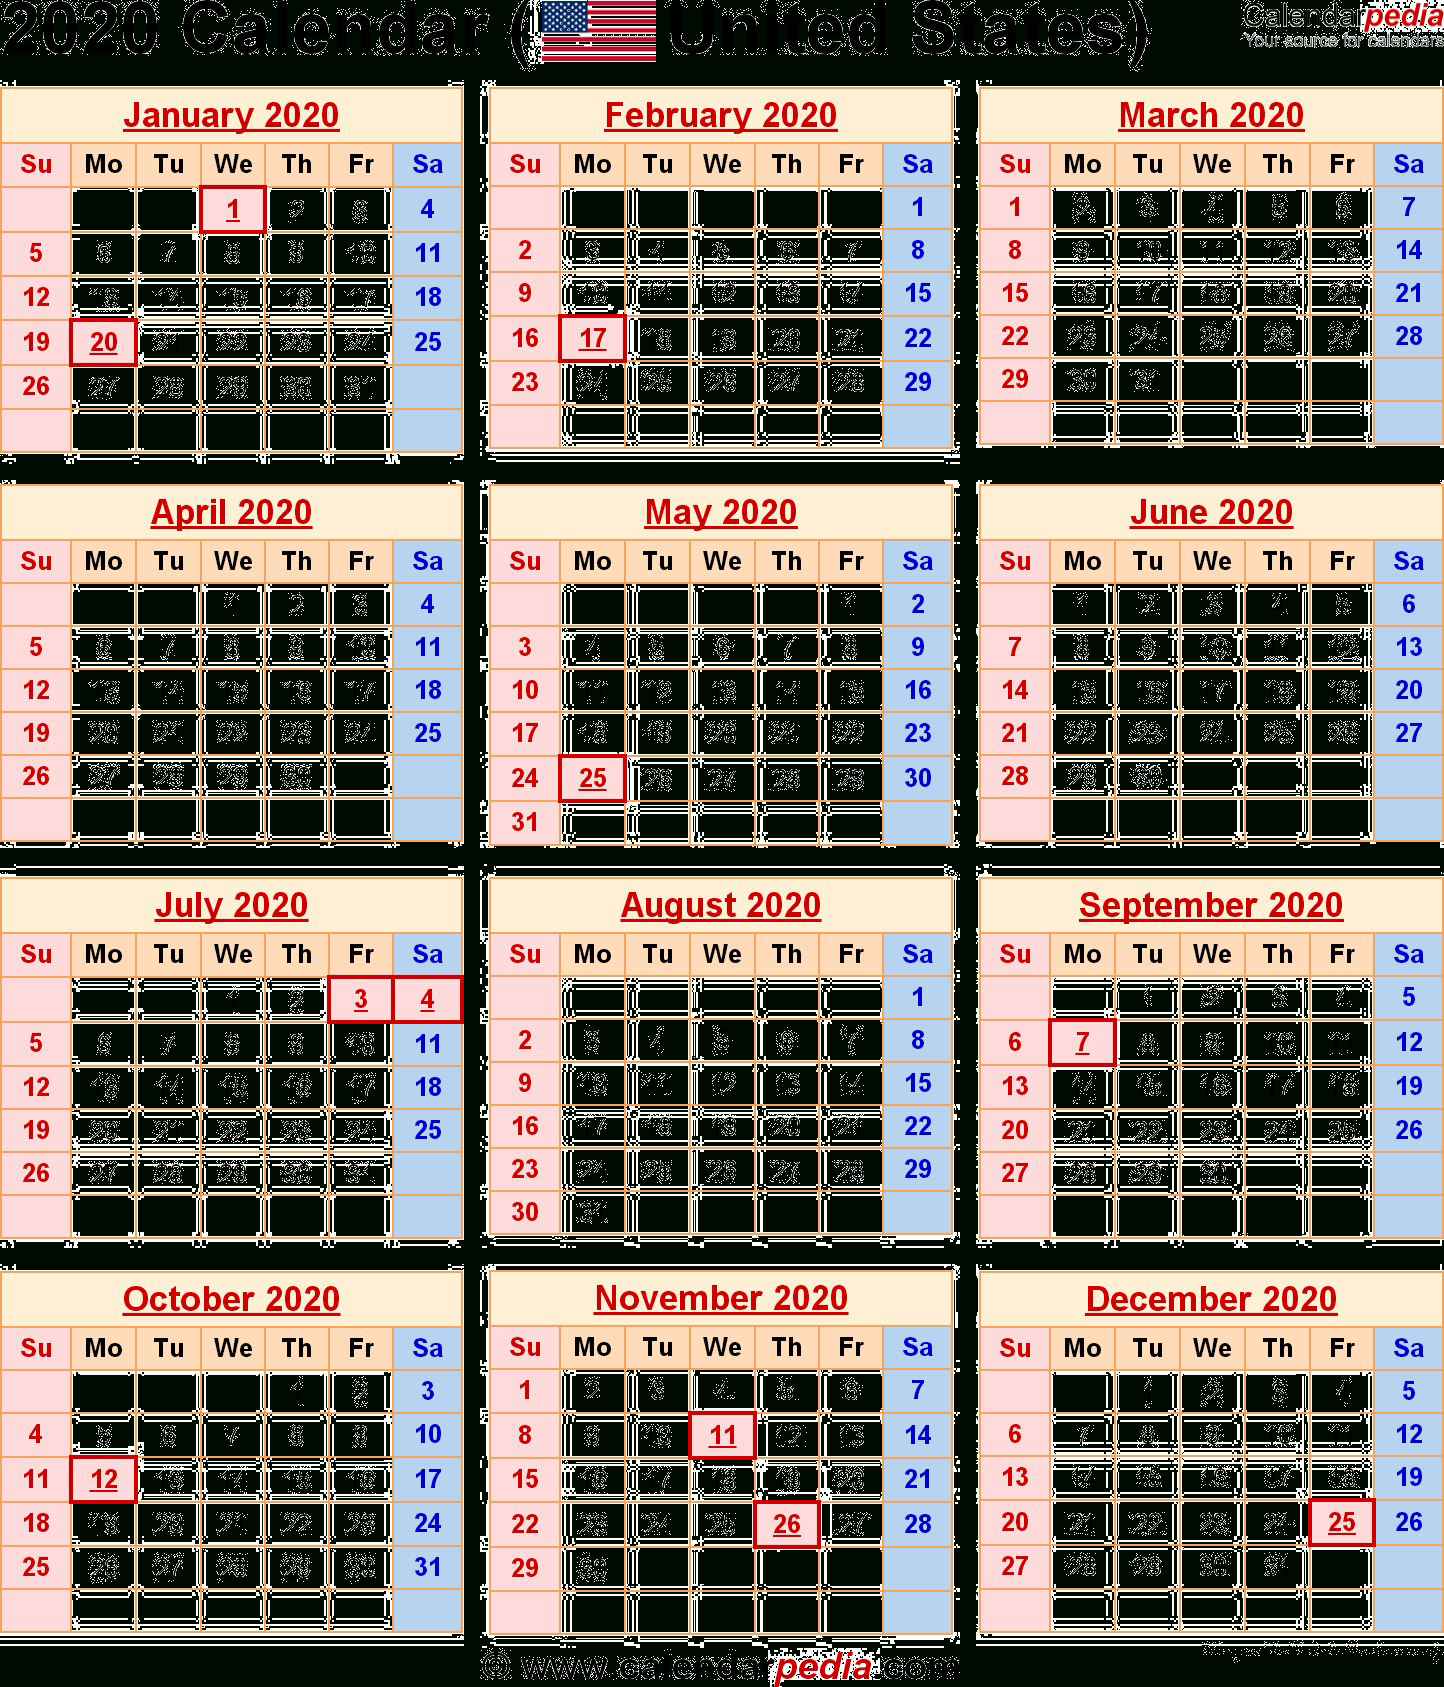 Government Calendar 2020 With Holidays   Calendar Template inside 2022 Federal Calendar Opm